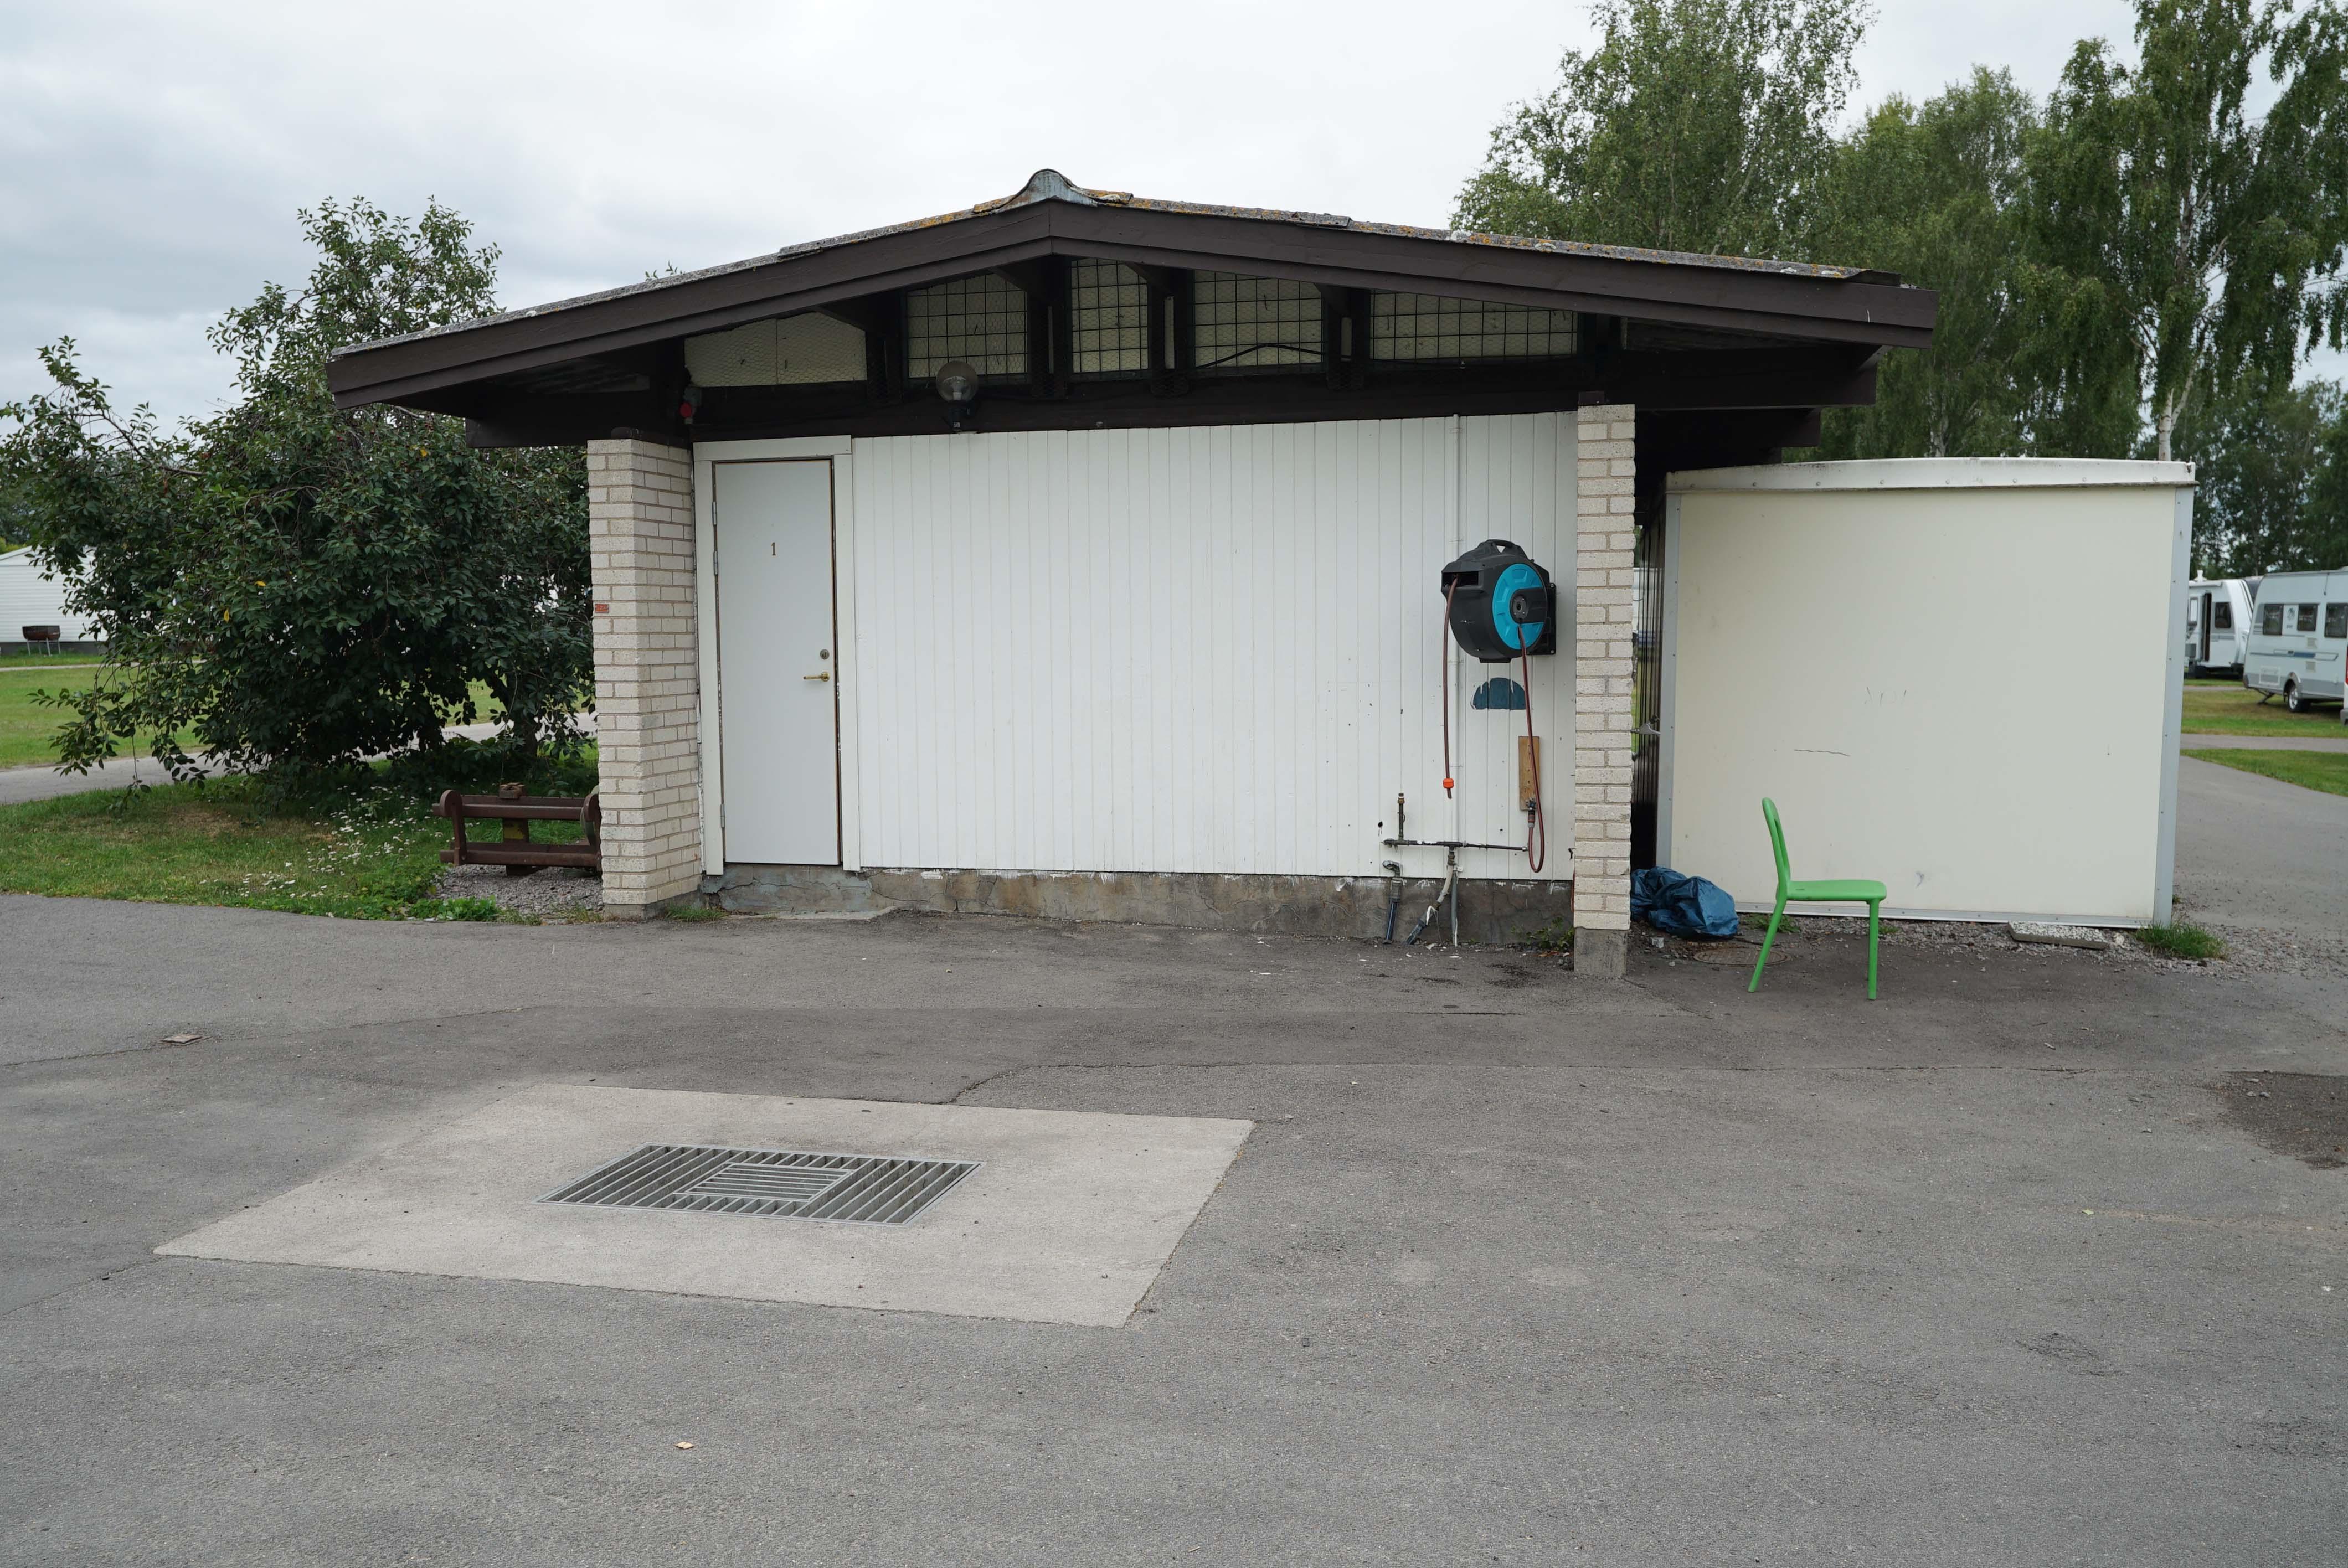 Norrköping_Camping07